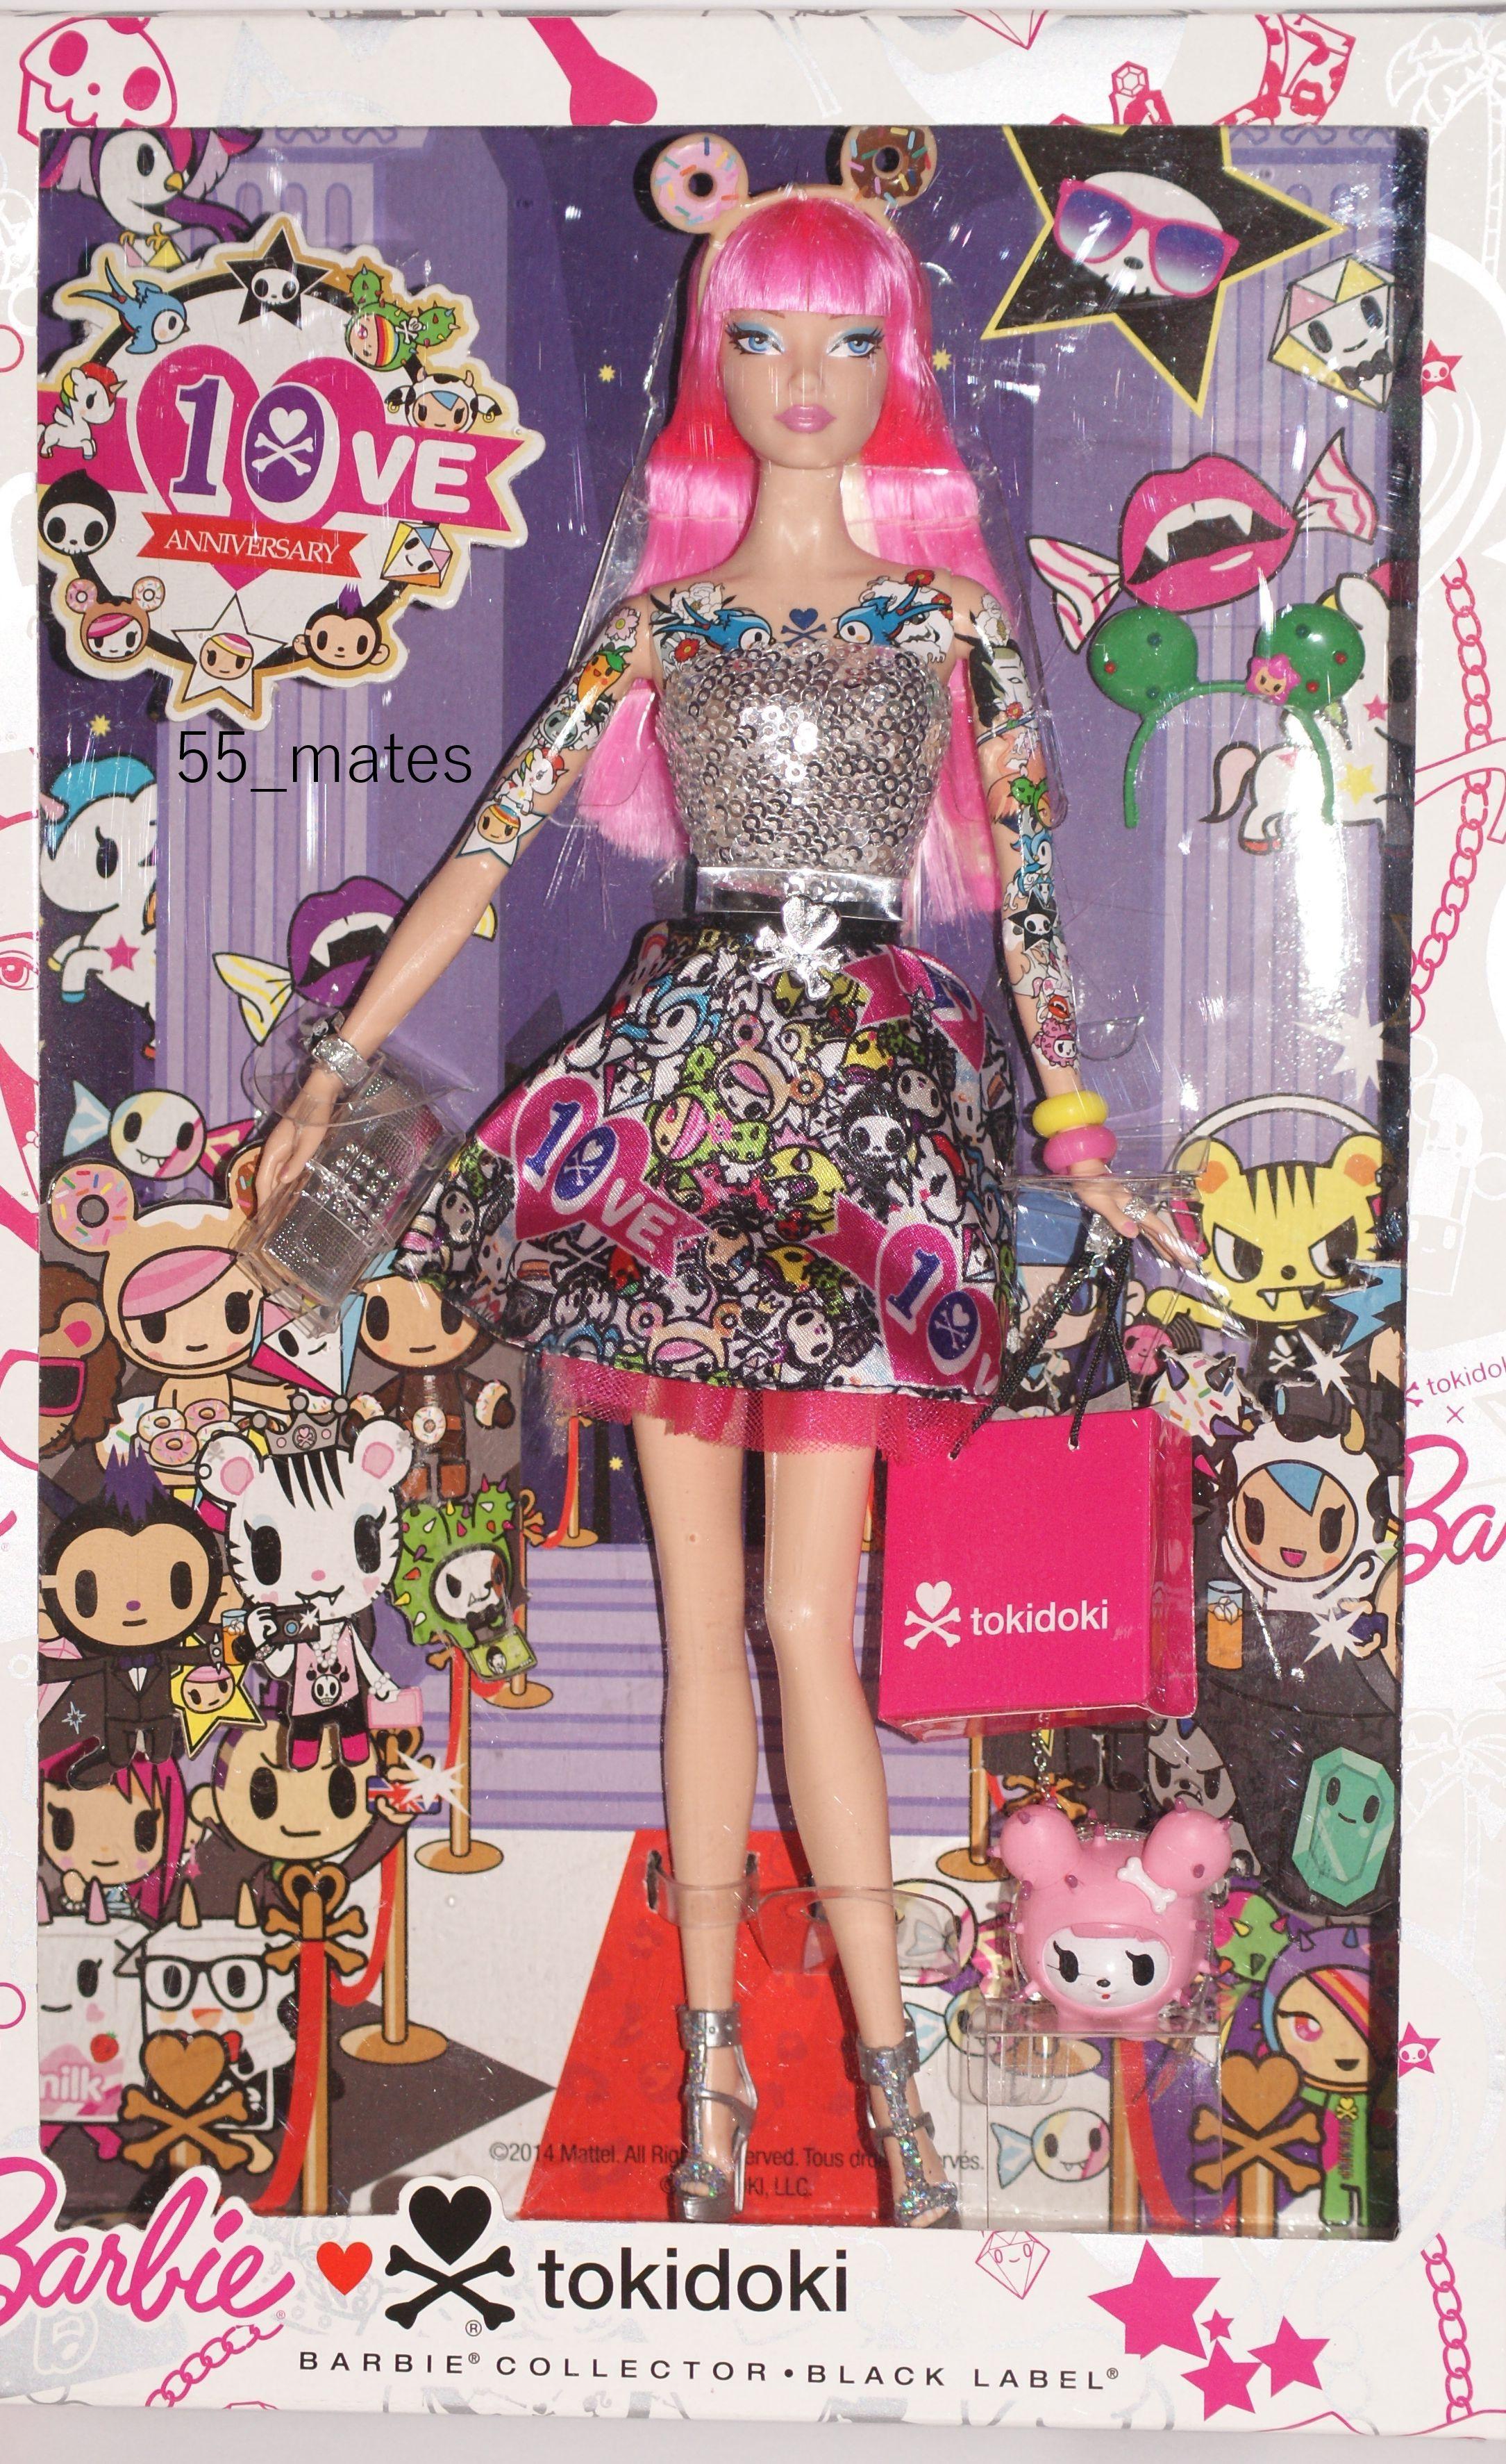 Black Label 10th Anniversary Pink Hair Tokidoki Barbie 2015 Nrfb